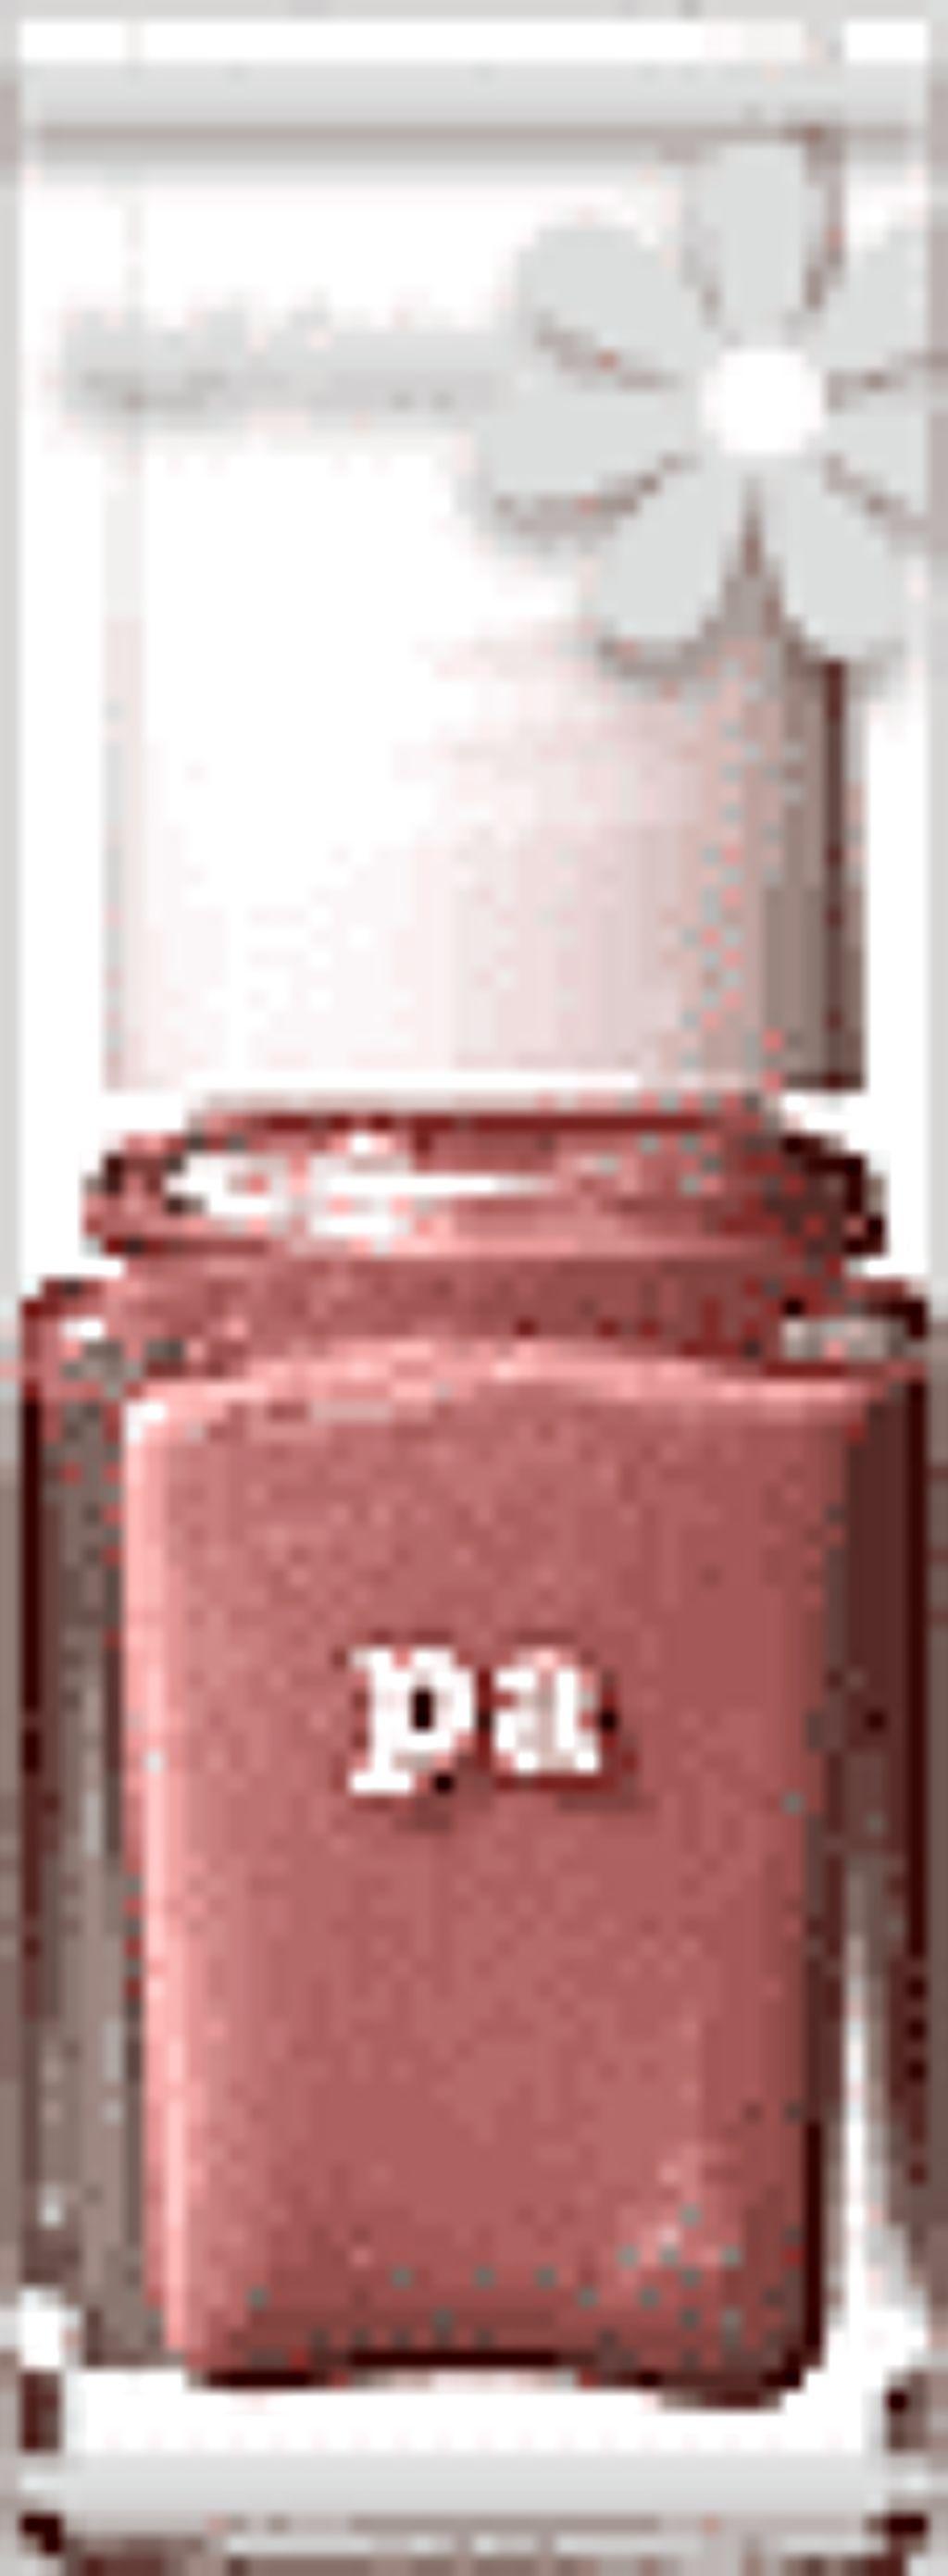 pa ネイルカラー(旧) A67